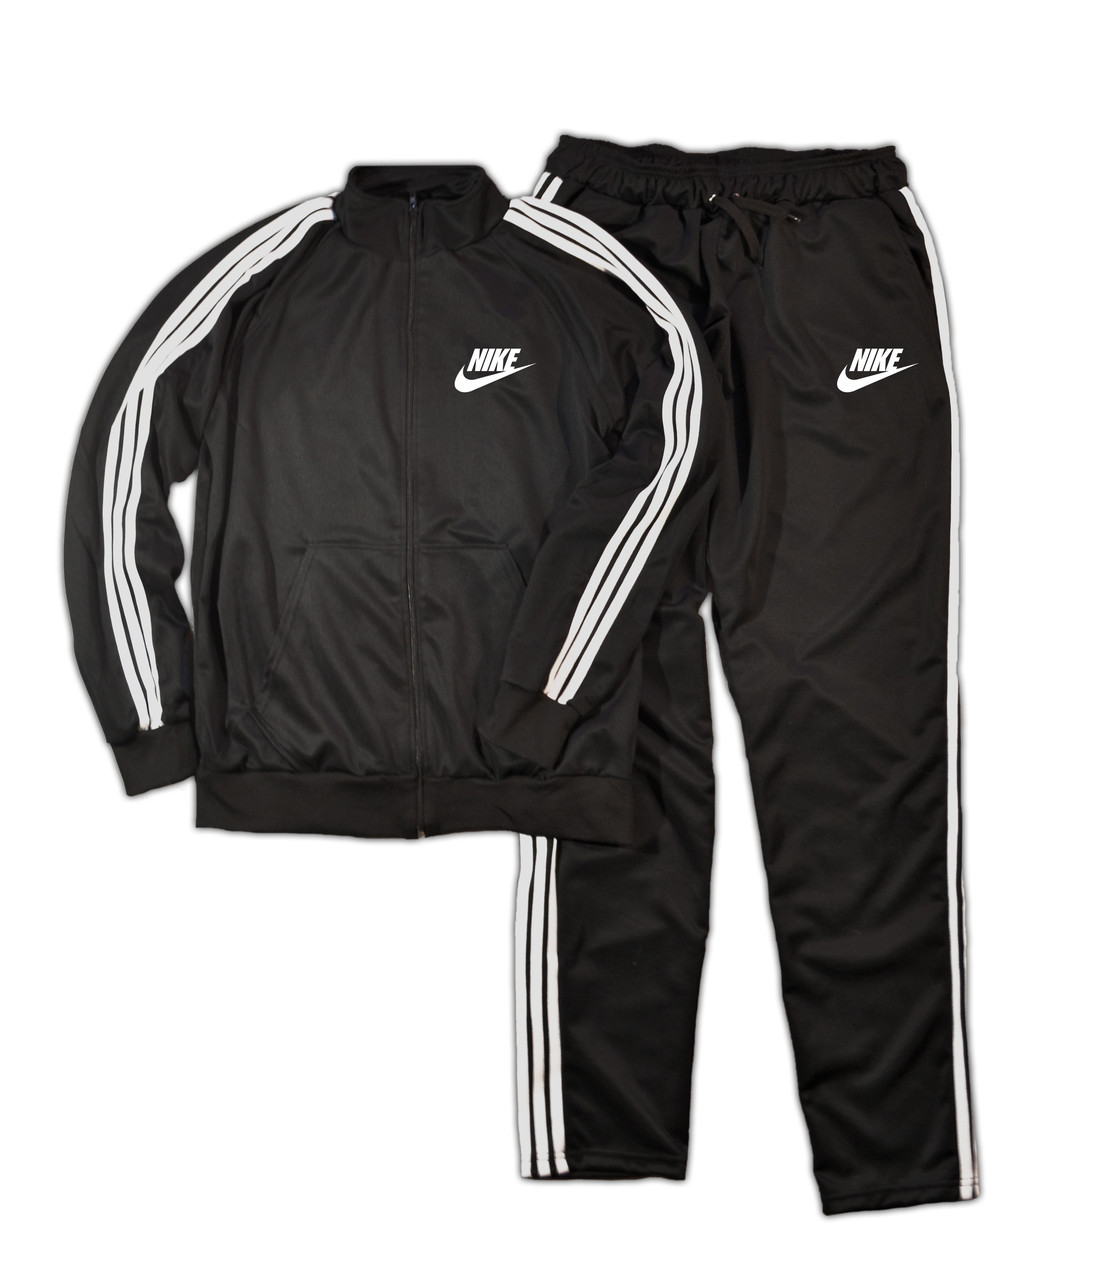 Летний спортивный костюм для тренировок Nike (Найк)